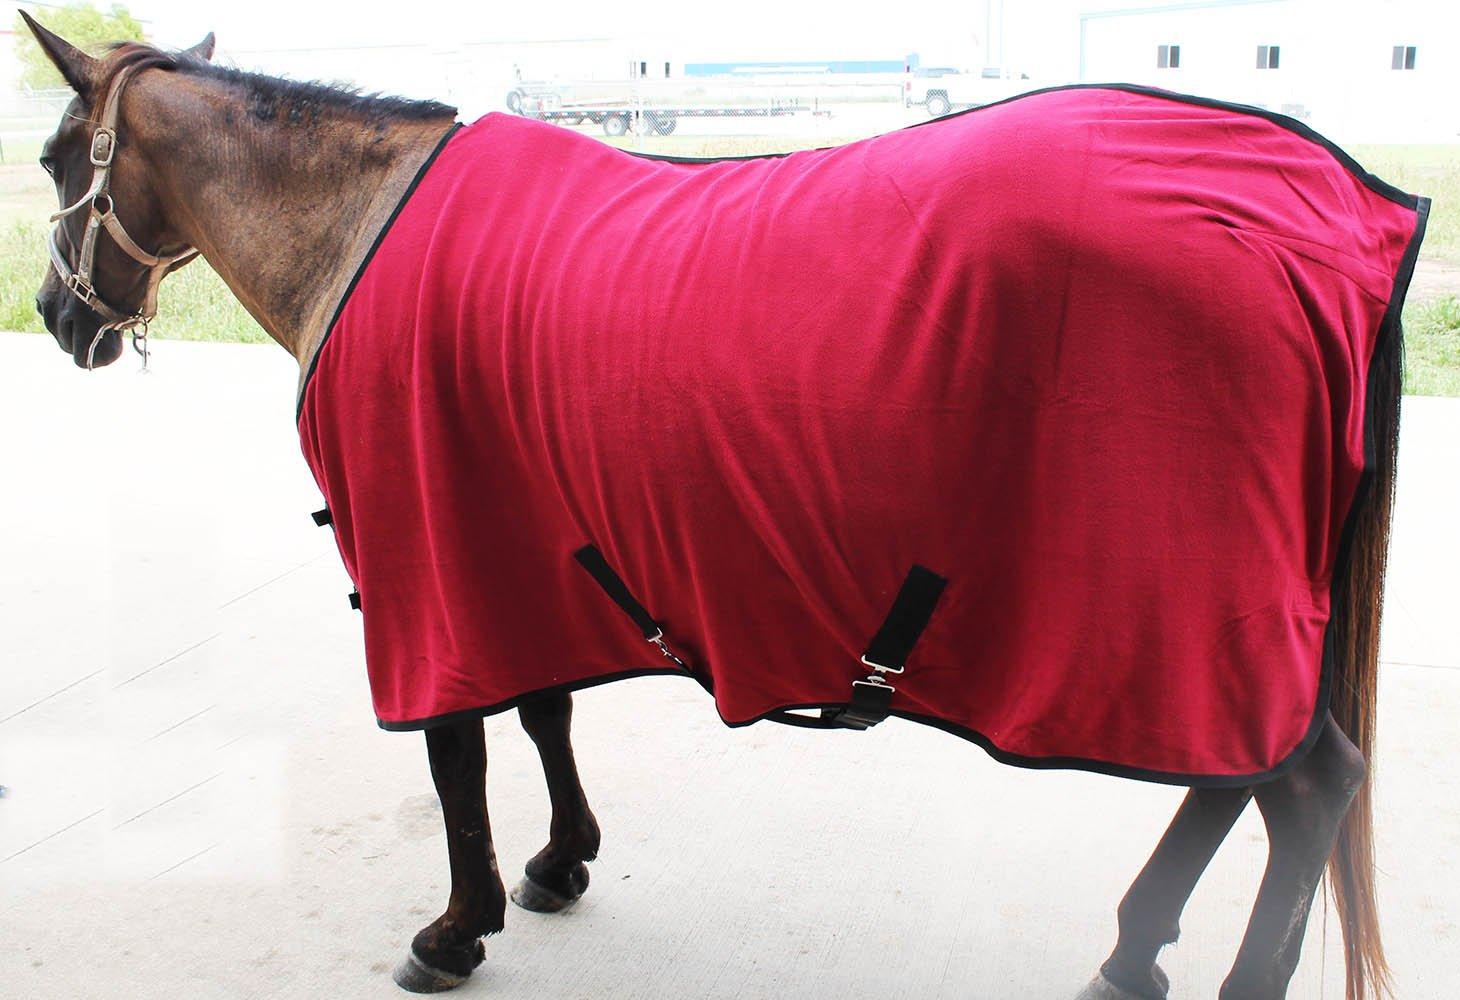 68 inches Challenger Horsewear 68 Horse Sheet Polar Fleece Cooler Exercise Blanket Wick Black Trim 4358